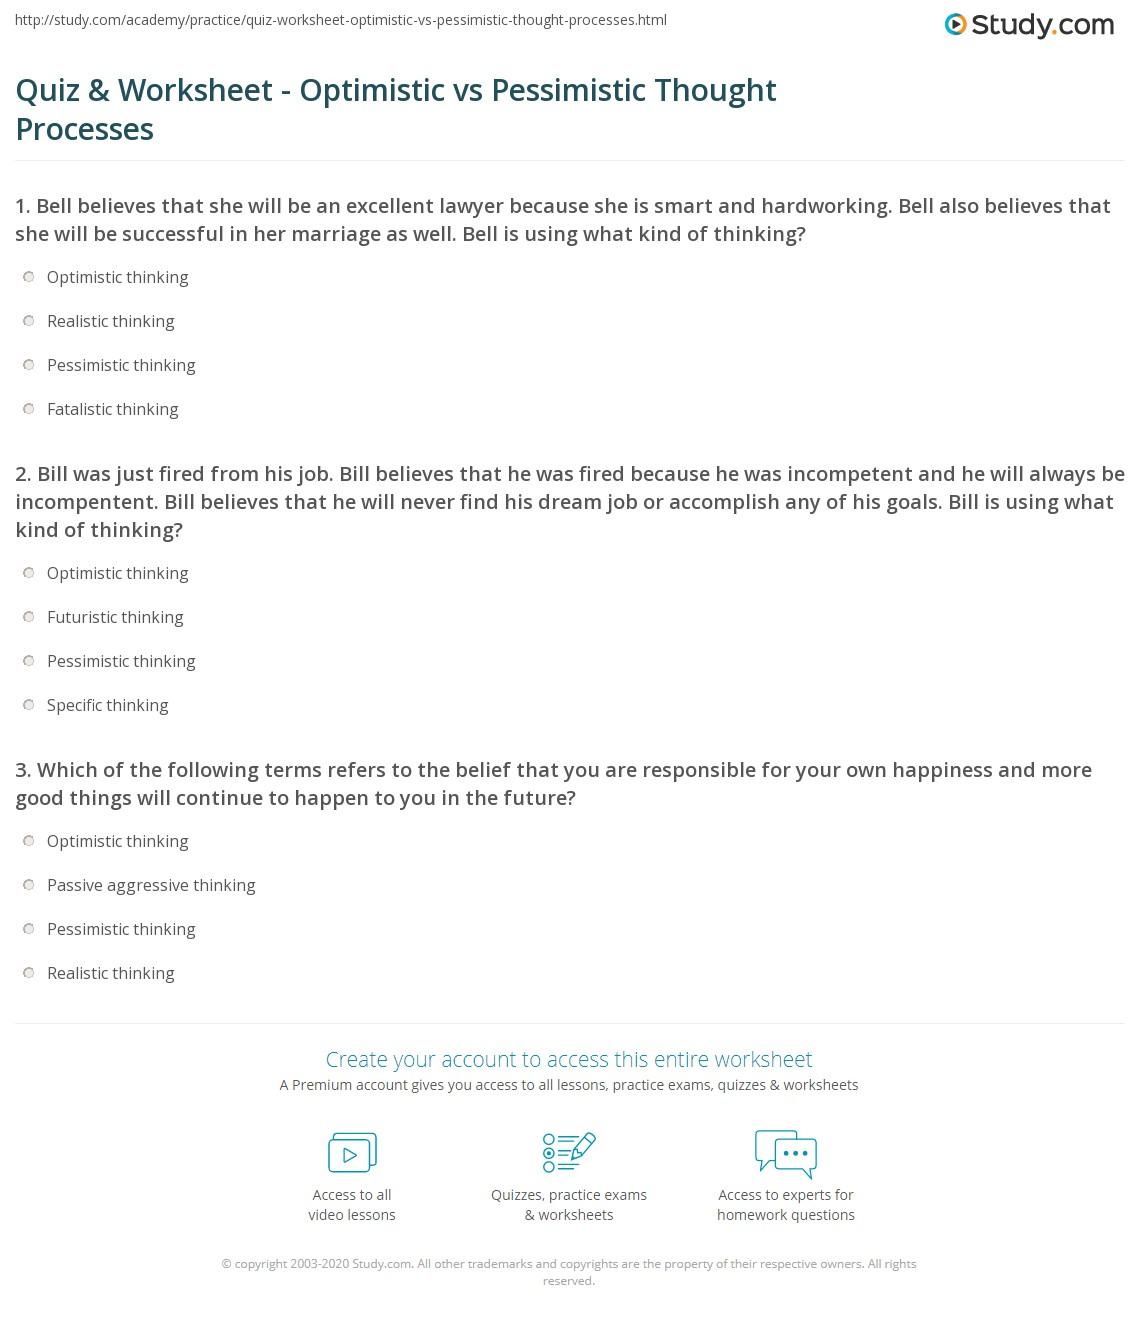 Quiz & Worksheet - Optimistic vs Pessimistic Thought Processes ...